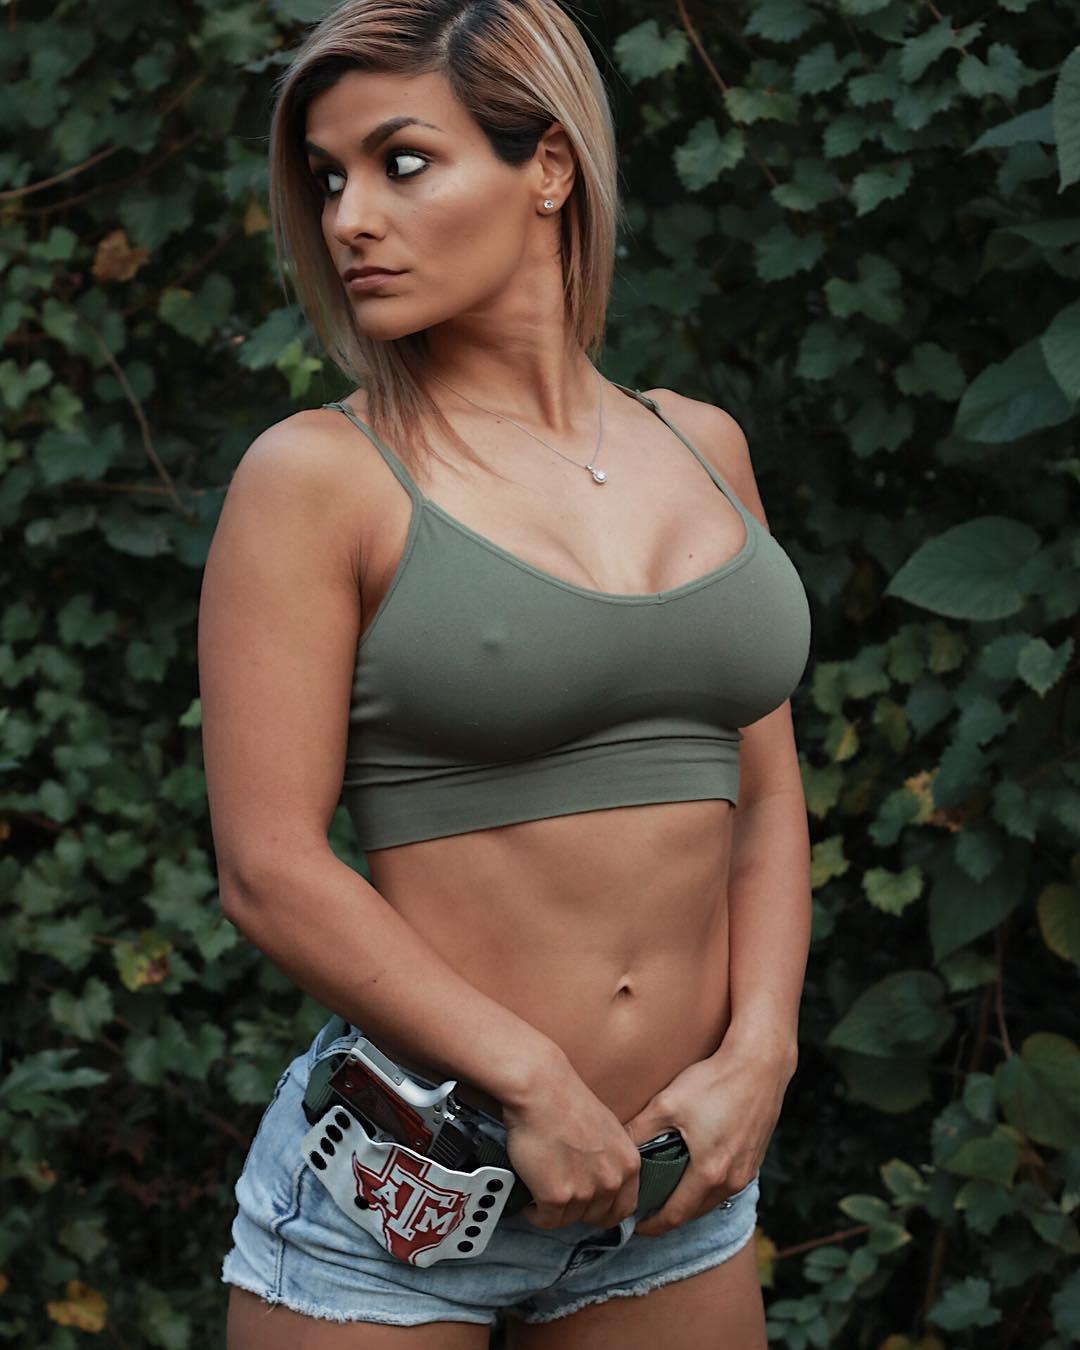 MMBOTD: Justine Texas